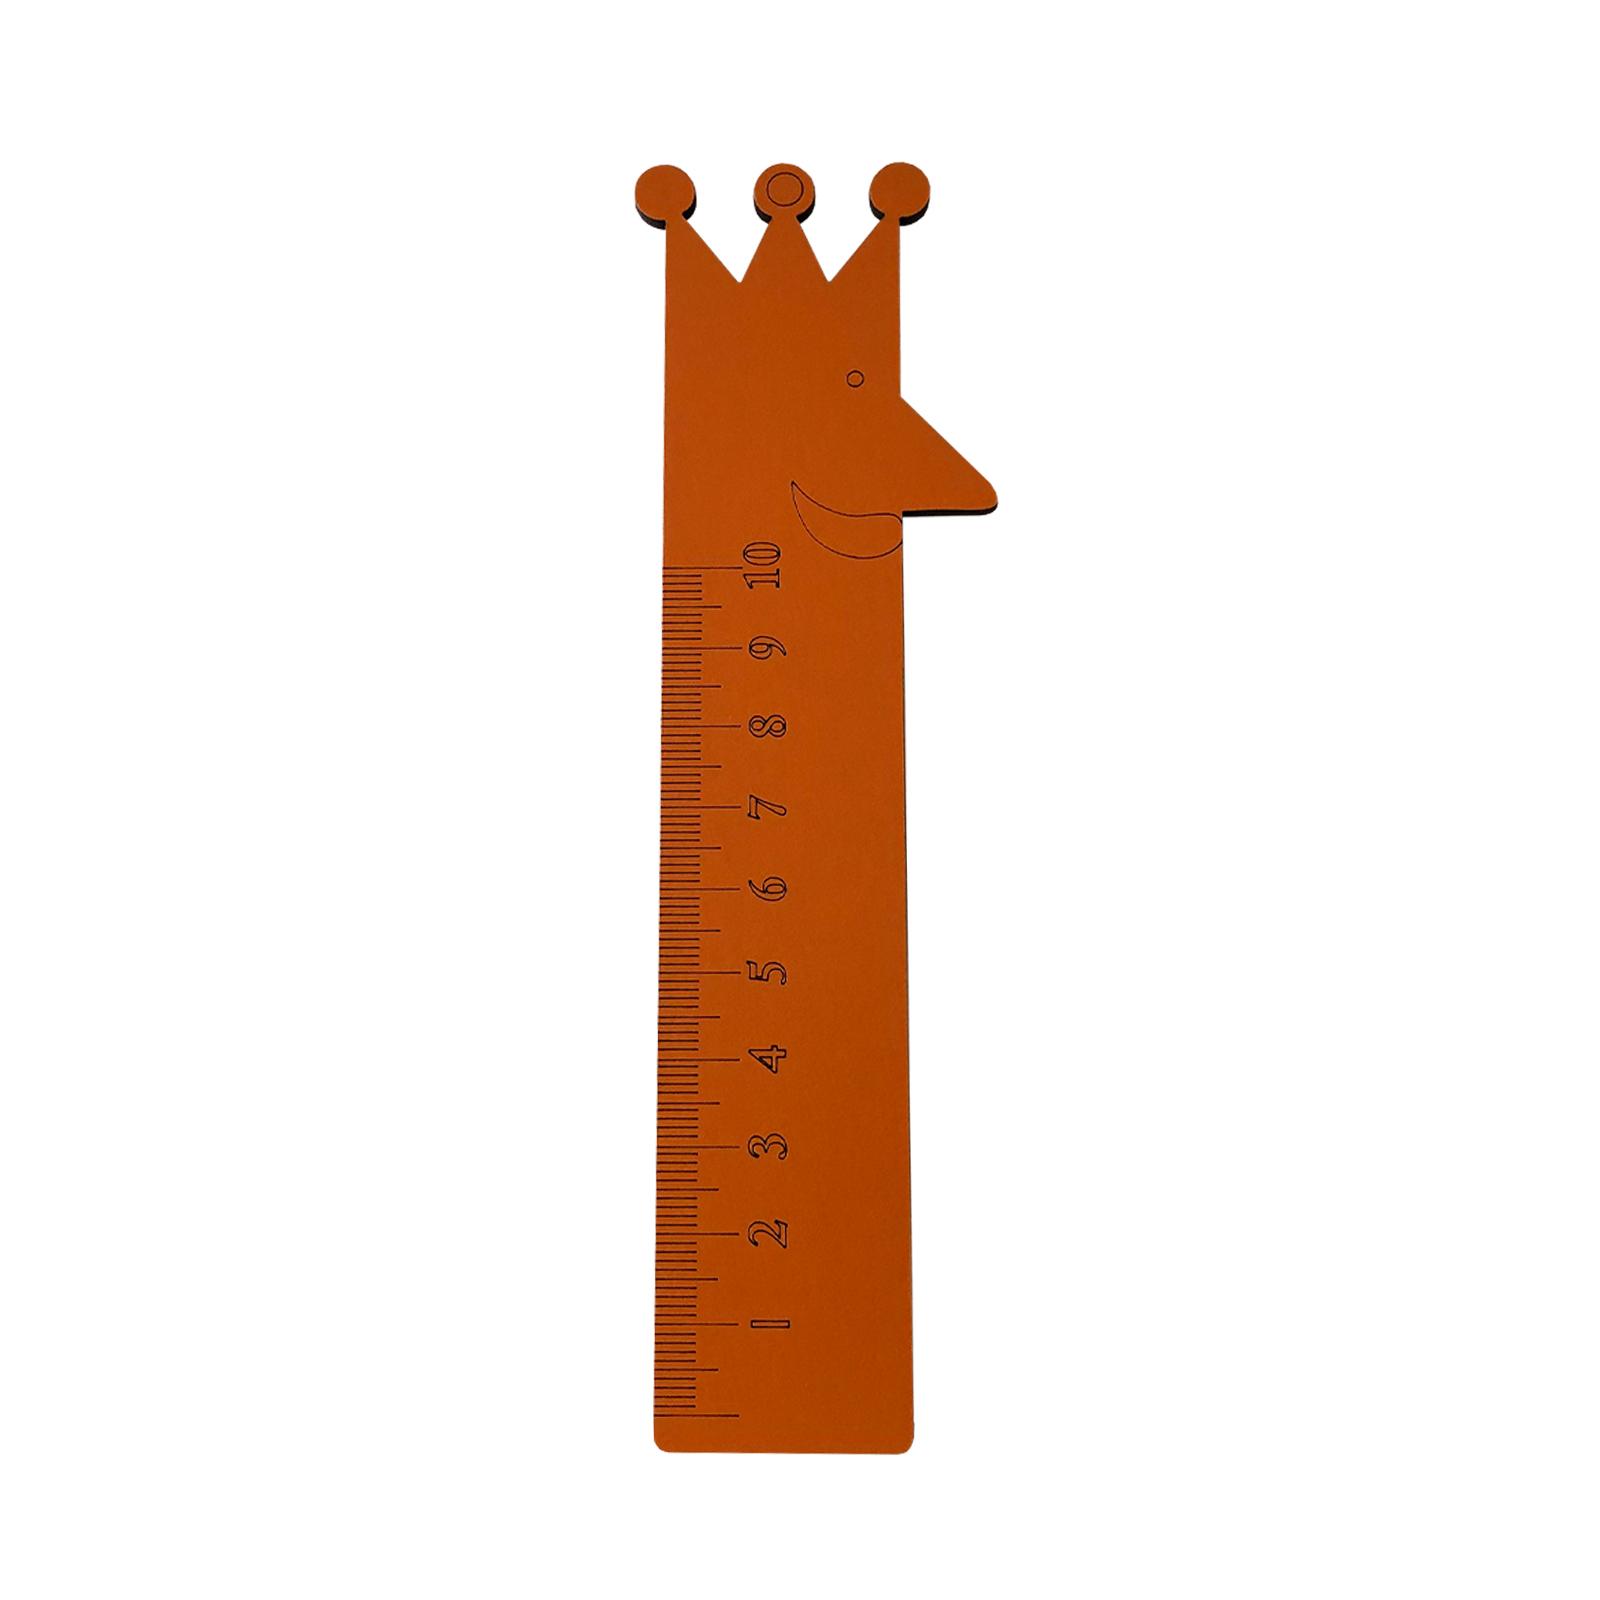 خط کش 10 سانتی متری طرح پادشاه کد kh2